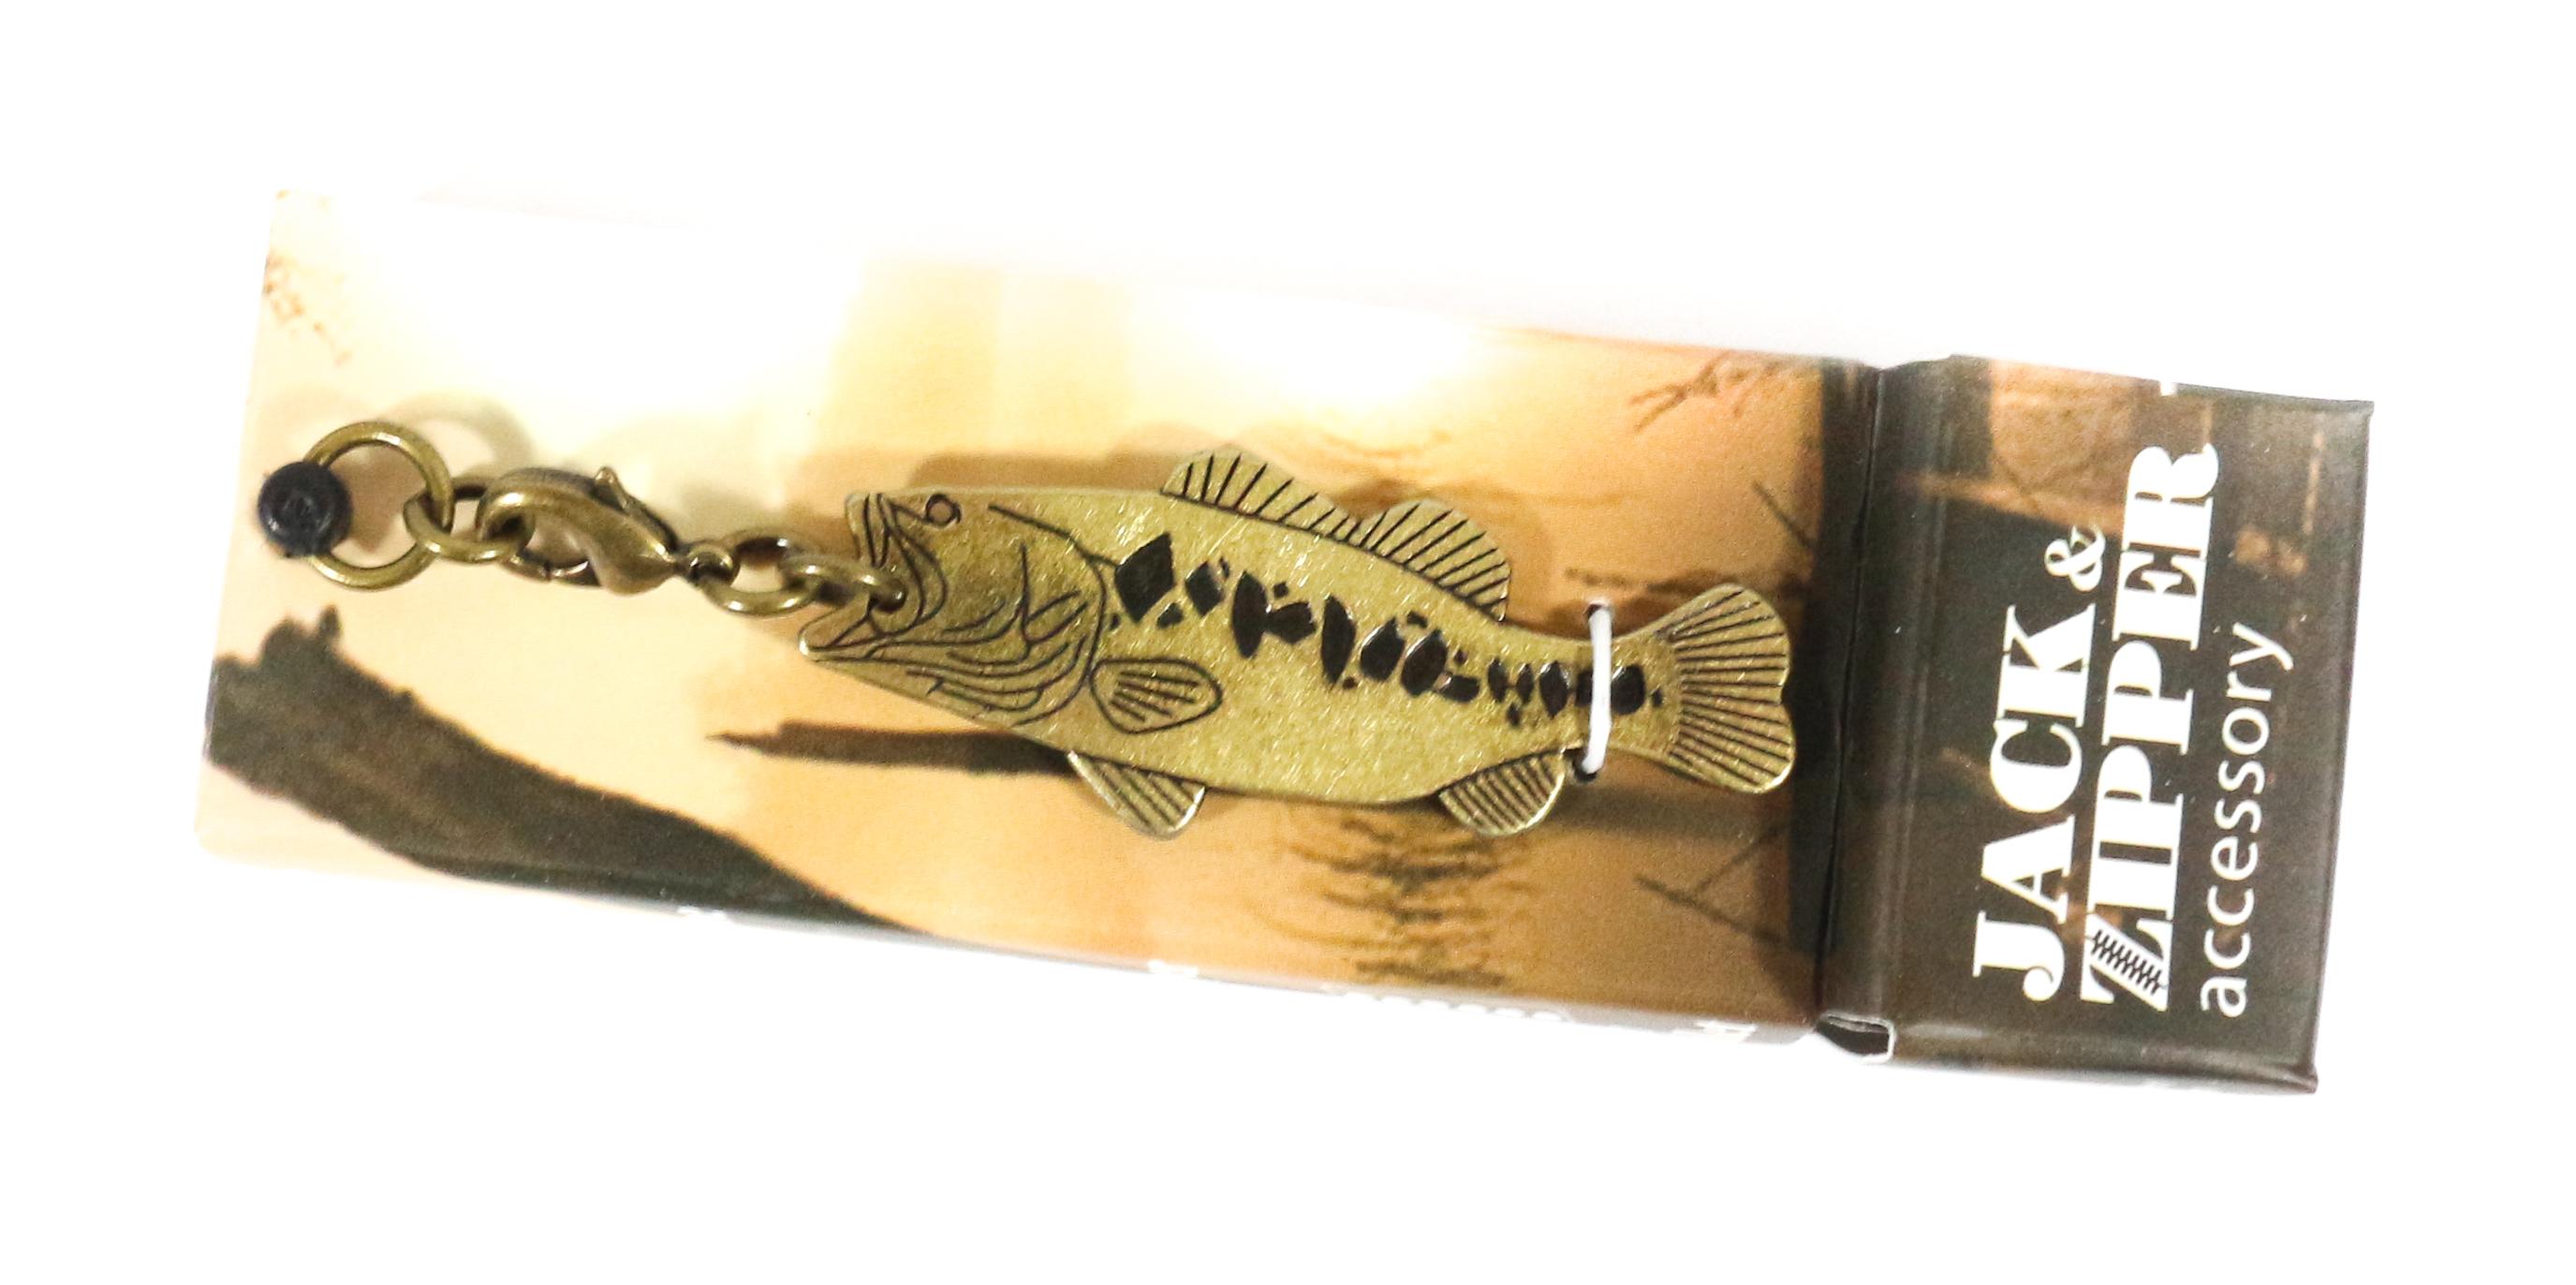 NOL Corp UOJ-1-02 JZ Key Chain Black Bass Antique GD (4118)